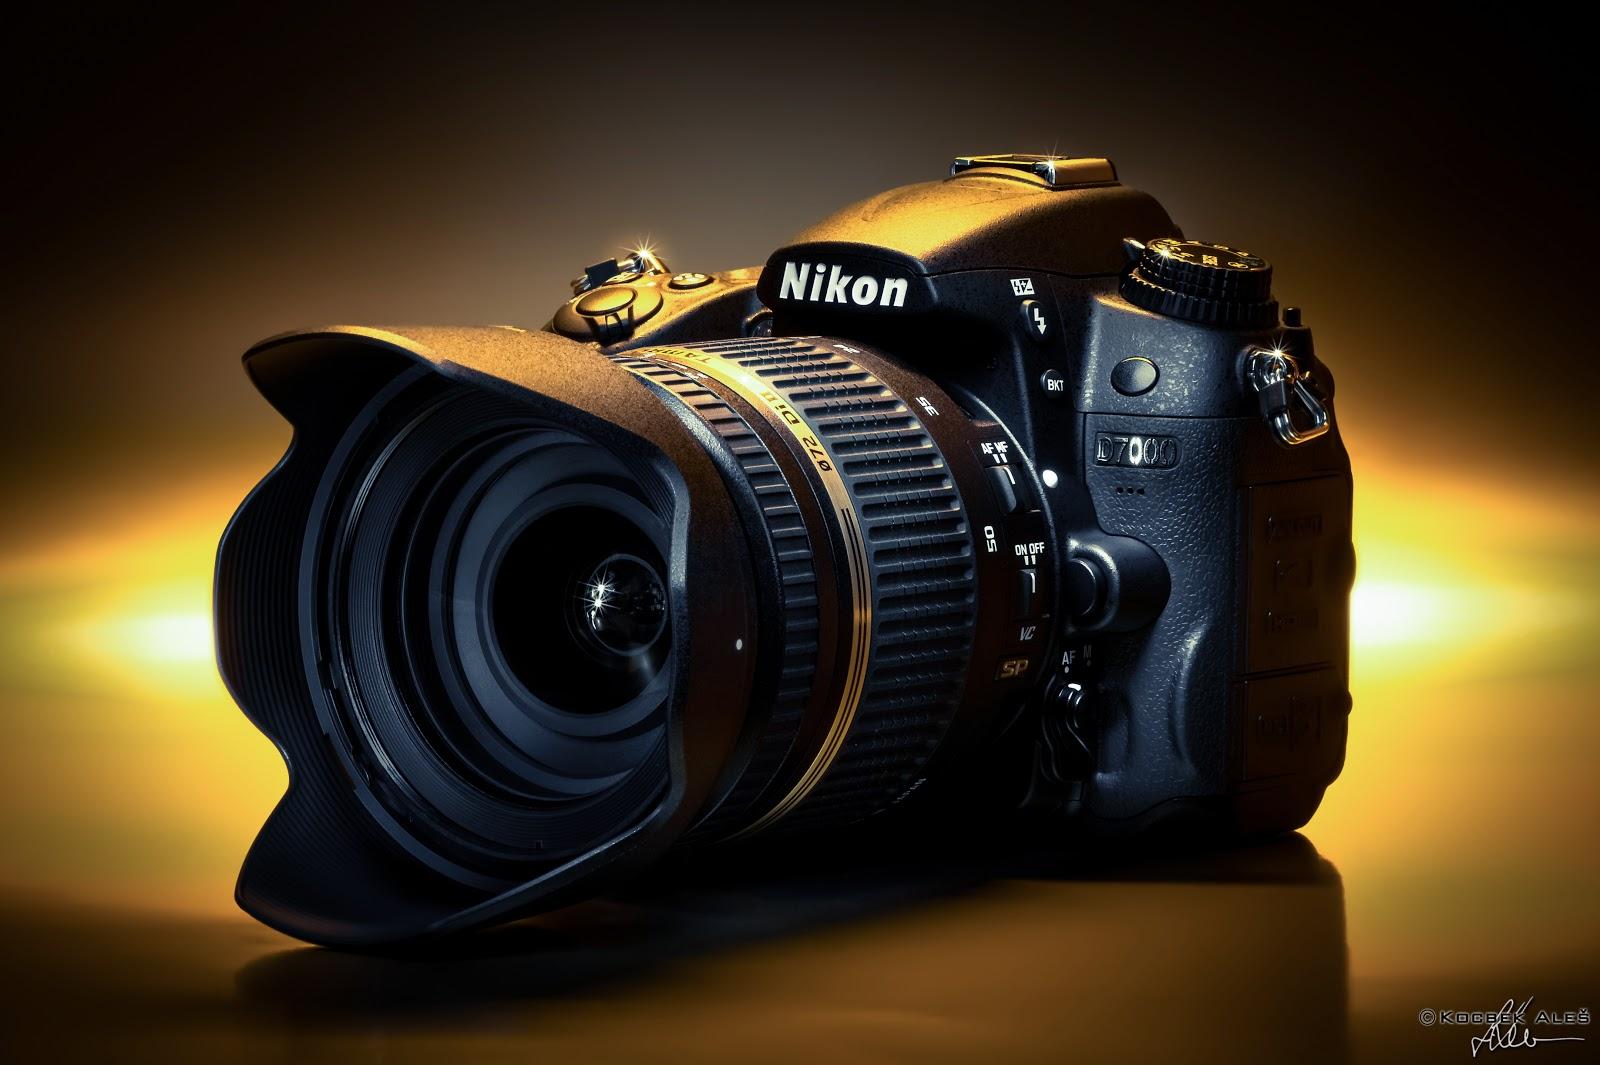 fotografo-fotografia.jpg